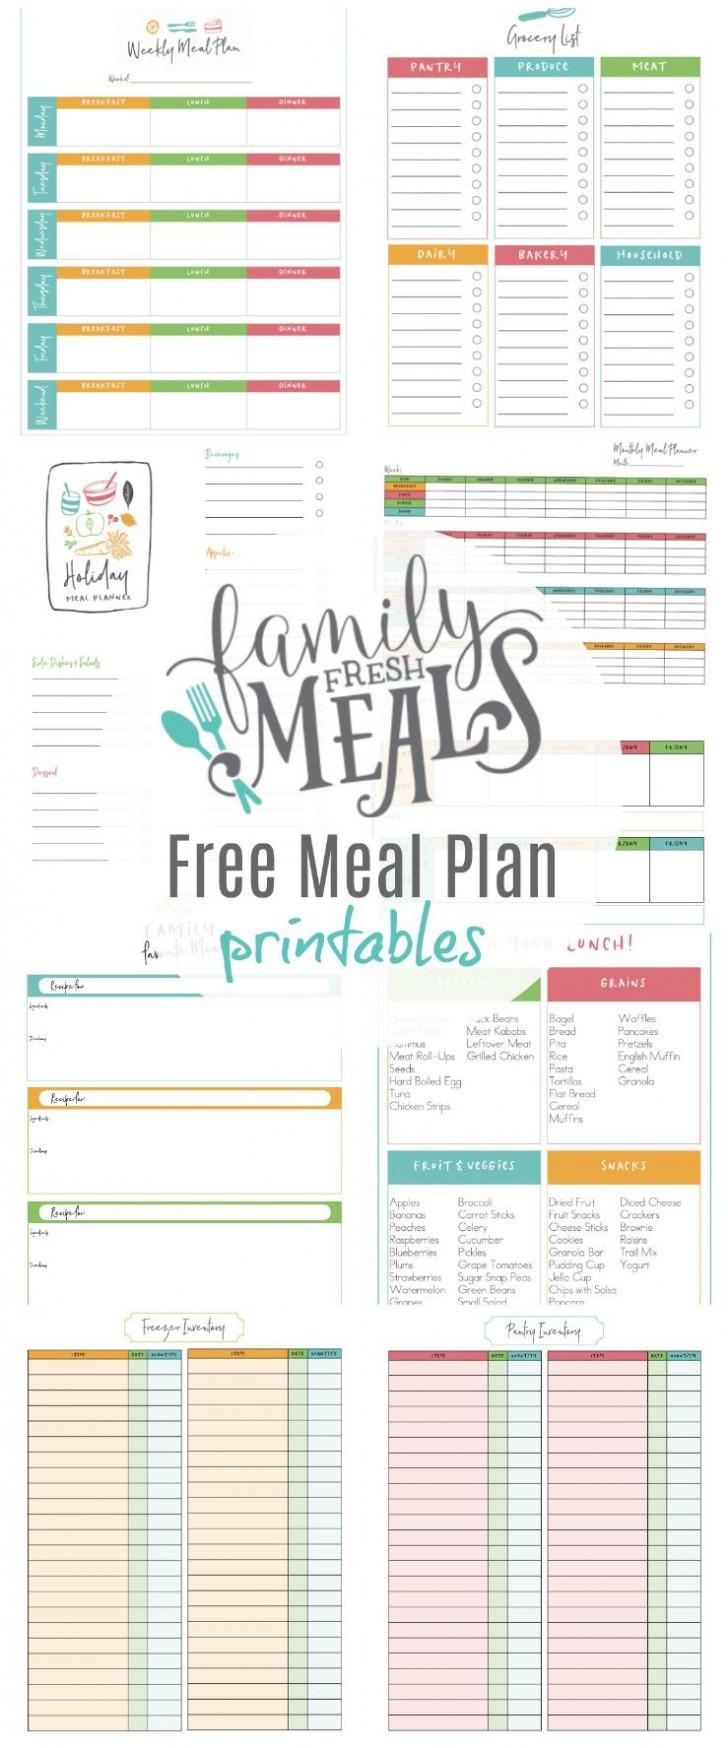 003 Unbelievable Meal Plan Printable Pdf Photo  Worksheet Downloadable Template Sheet728